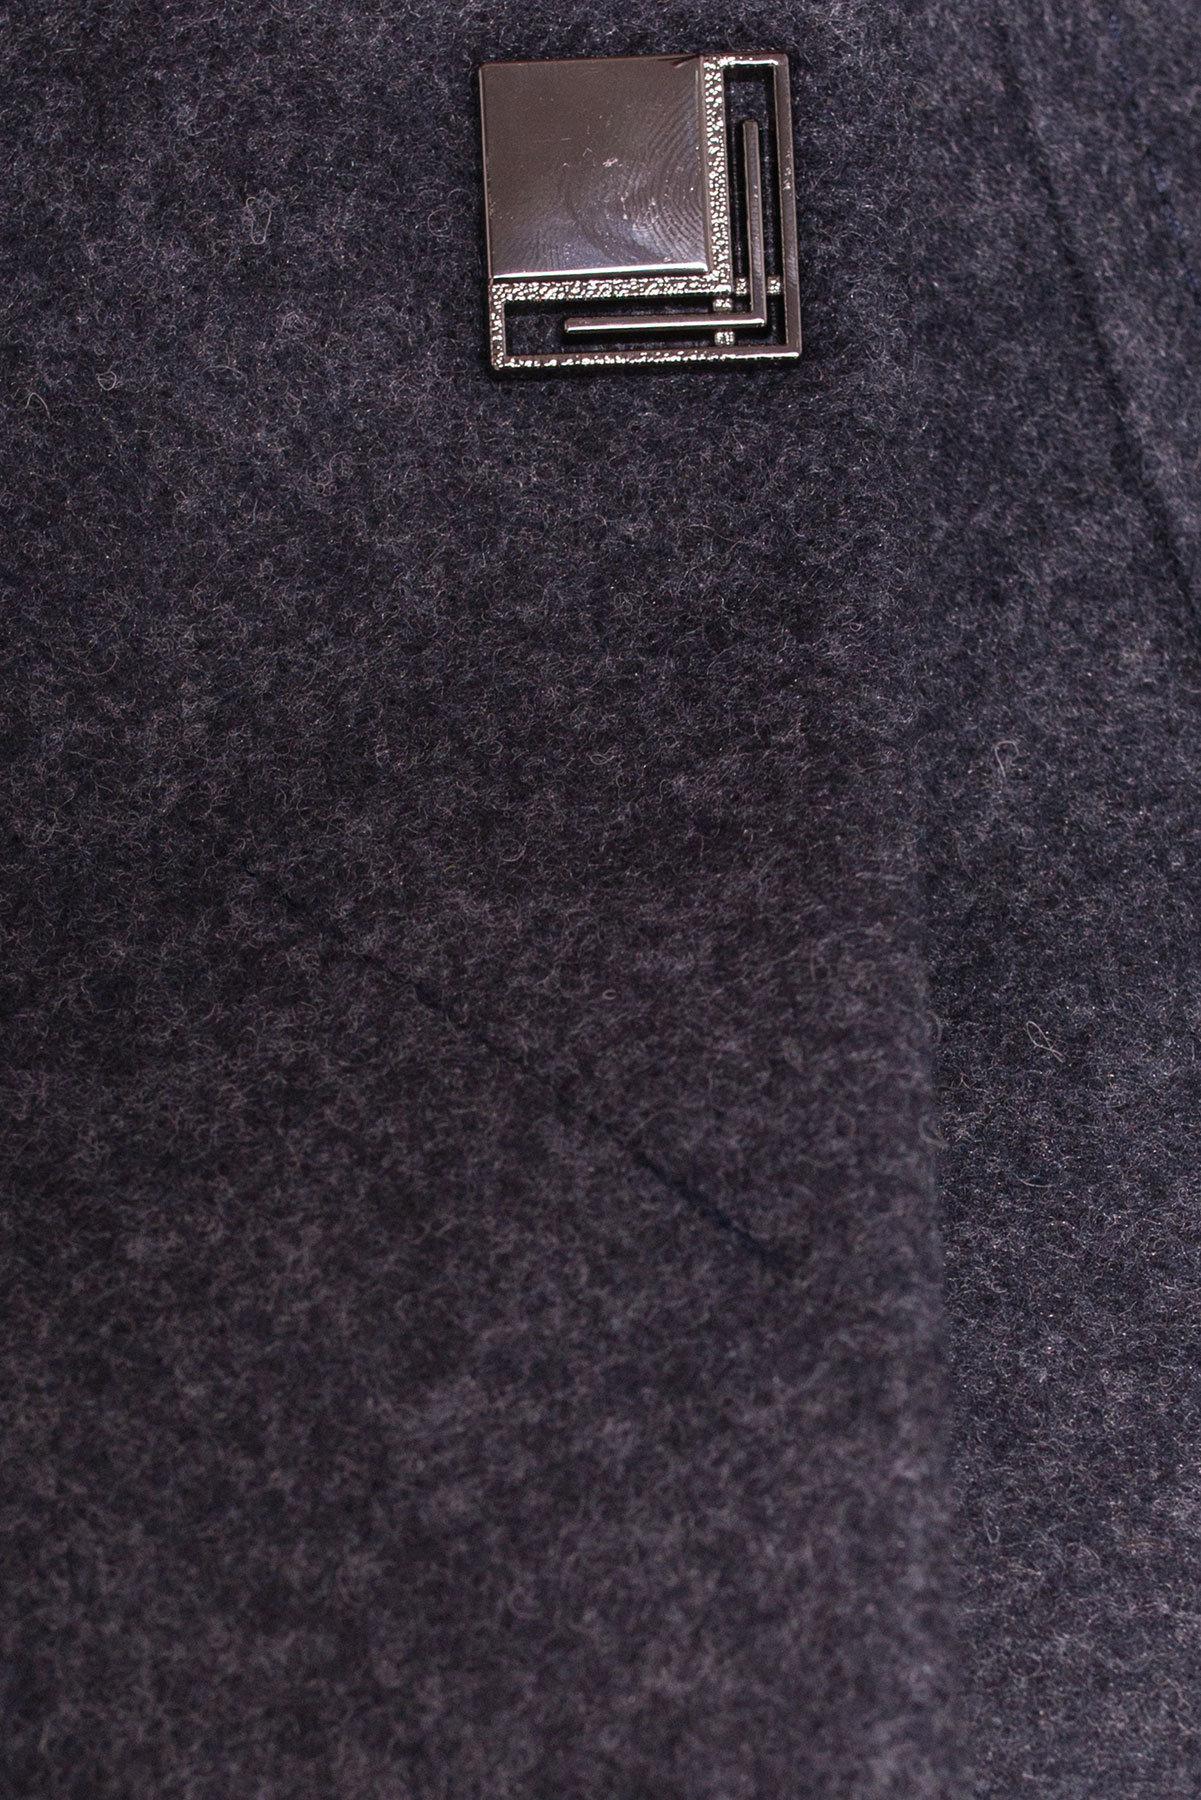 Пальто Шаника 5379 АРТ. 36615 Цвет: Темно-синий - фото 5, интернет магазин tm-modus.ru